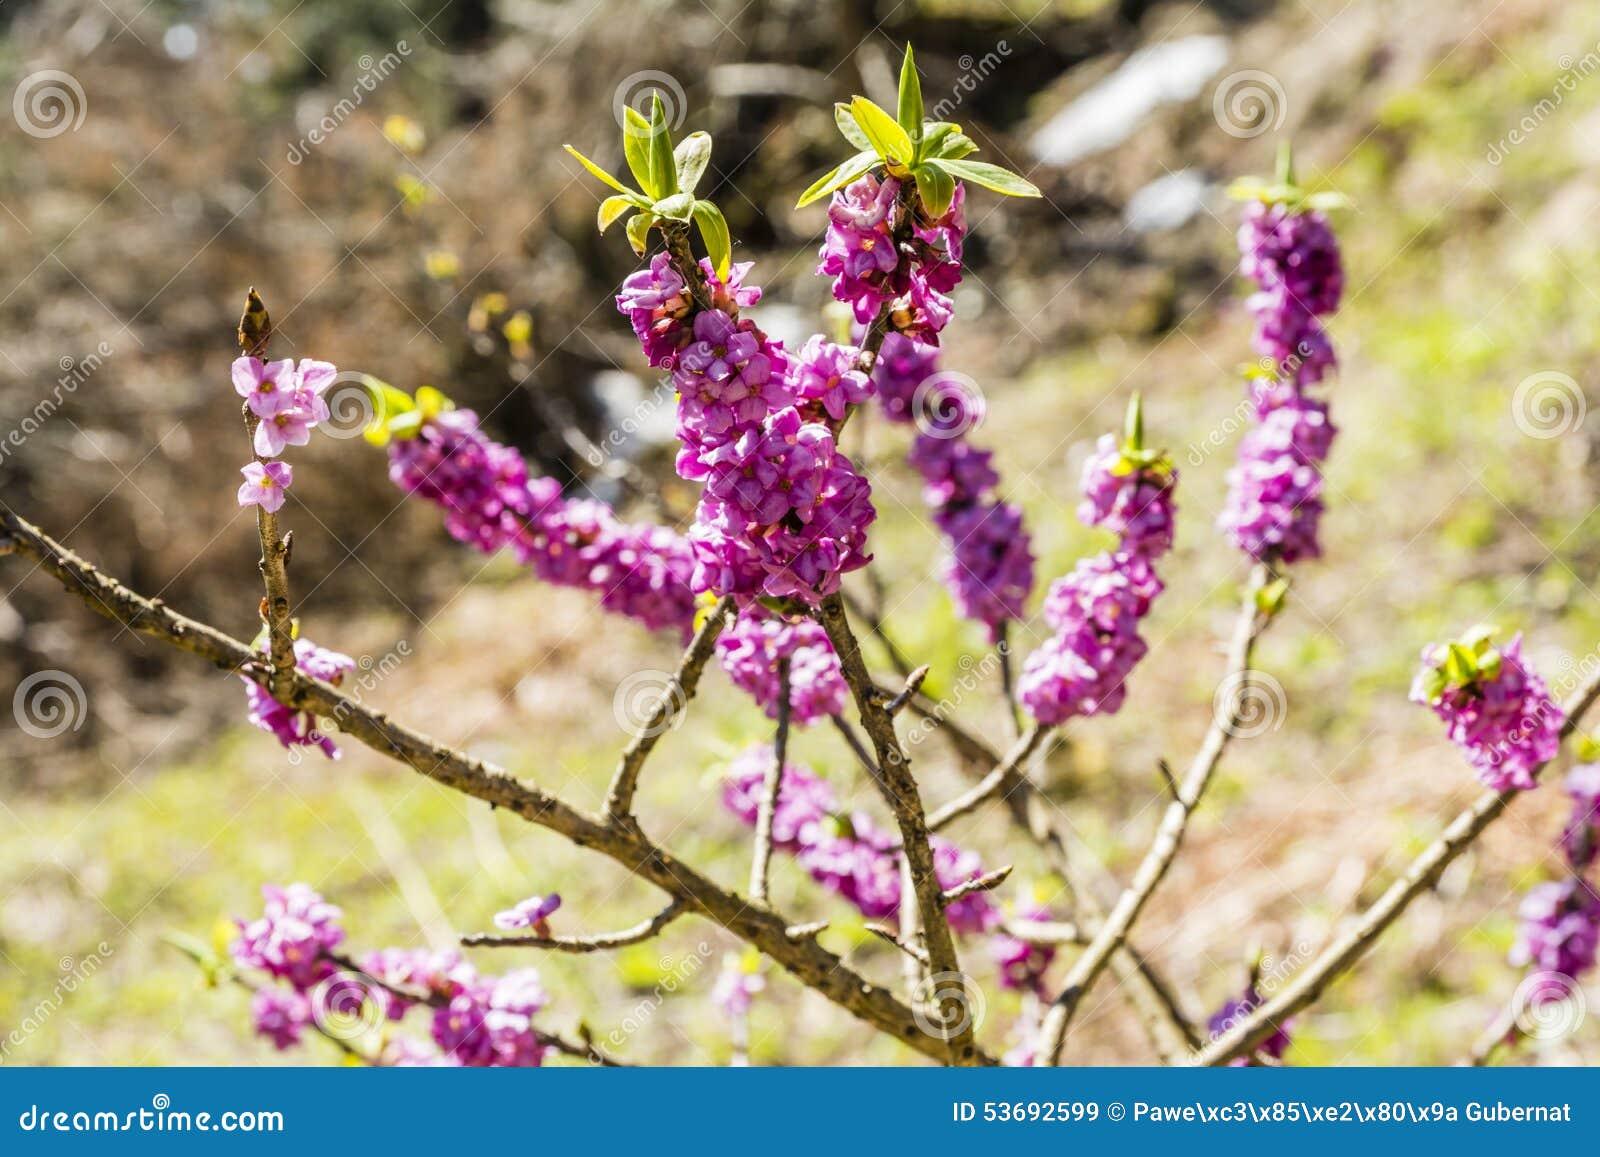 Daphne mezereum, February daphne, mezereon, mezereum, spurge laurel, spurge olive